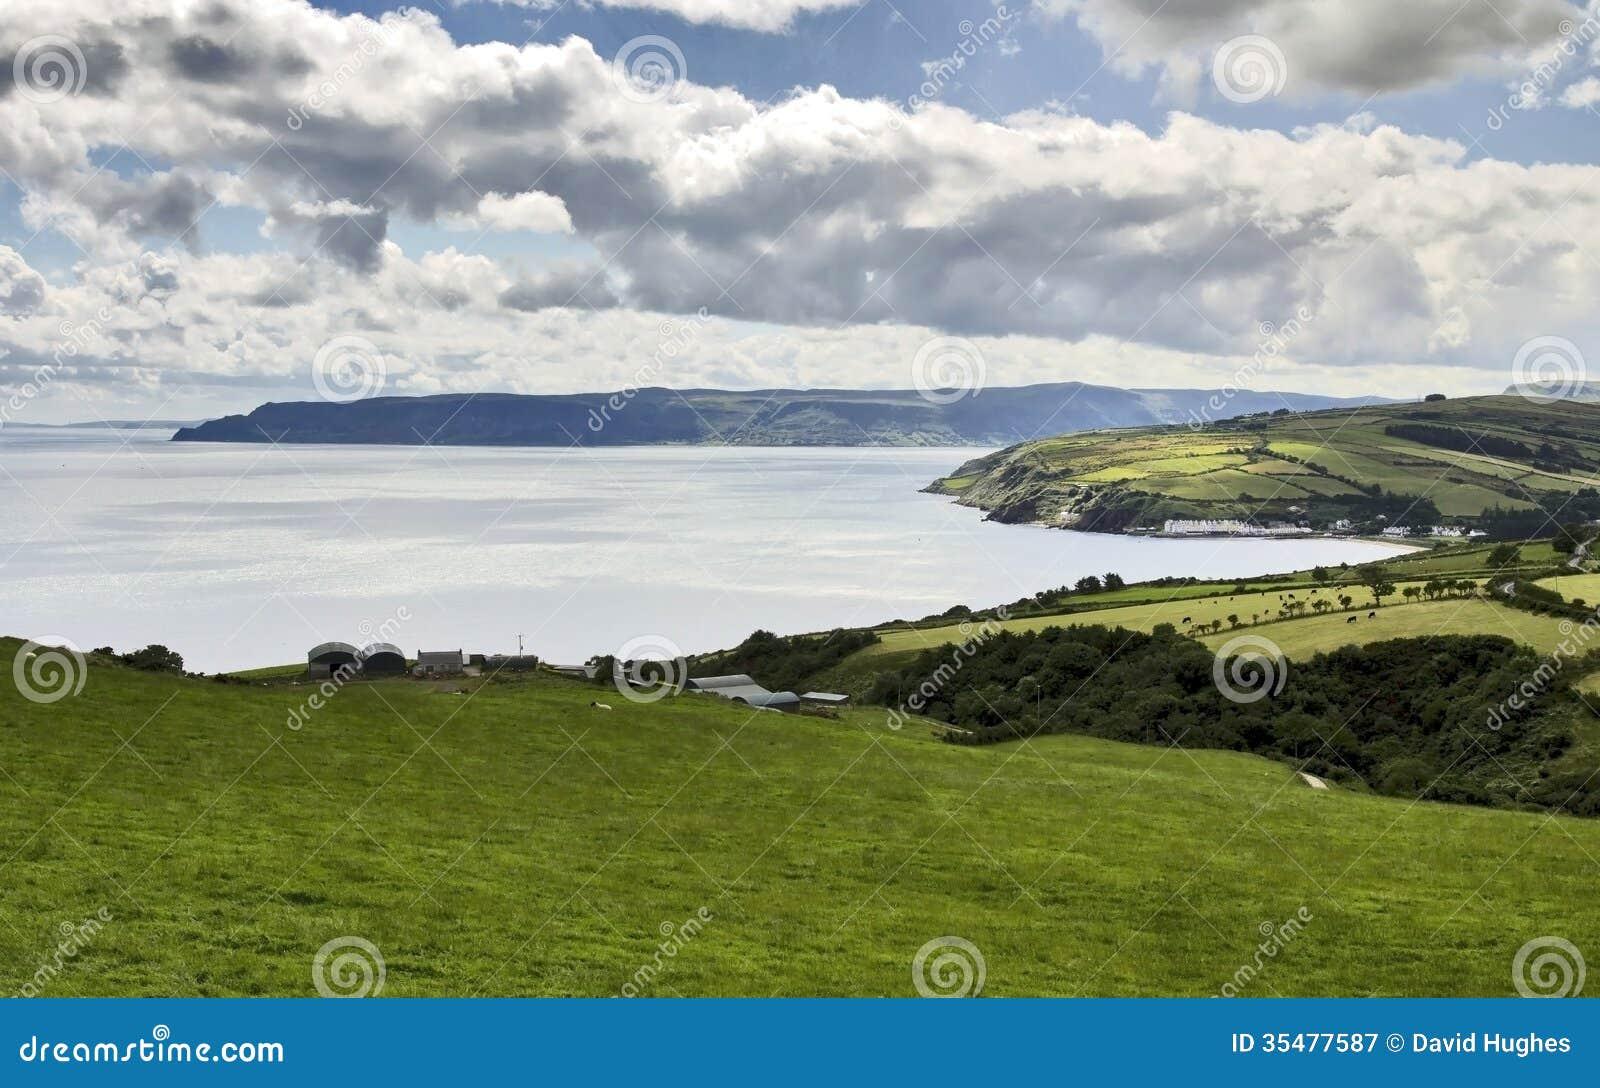 The Beautiful Antrim Coastline from Torr Head